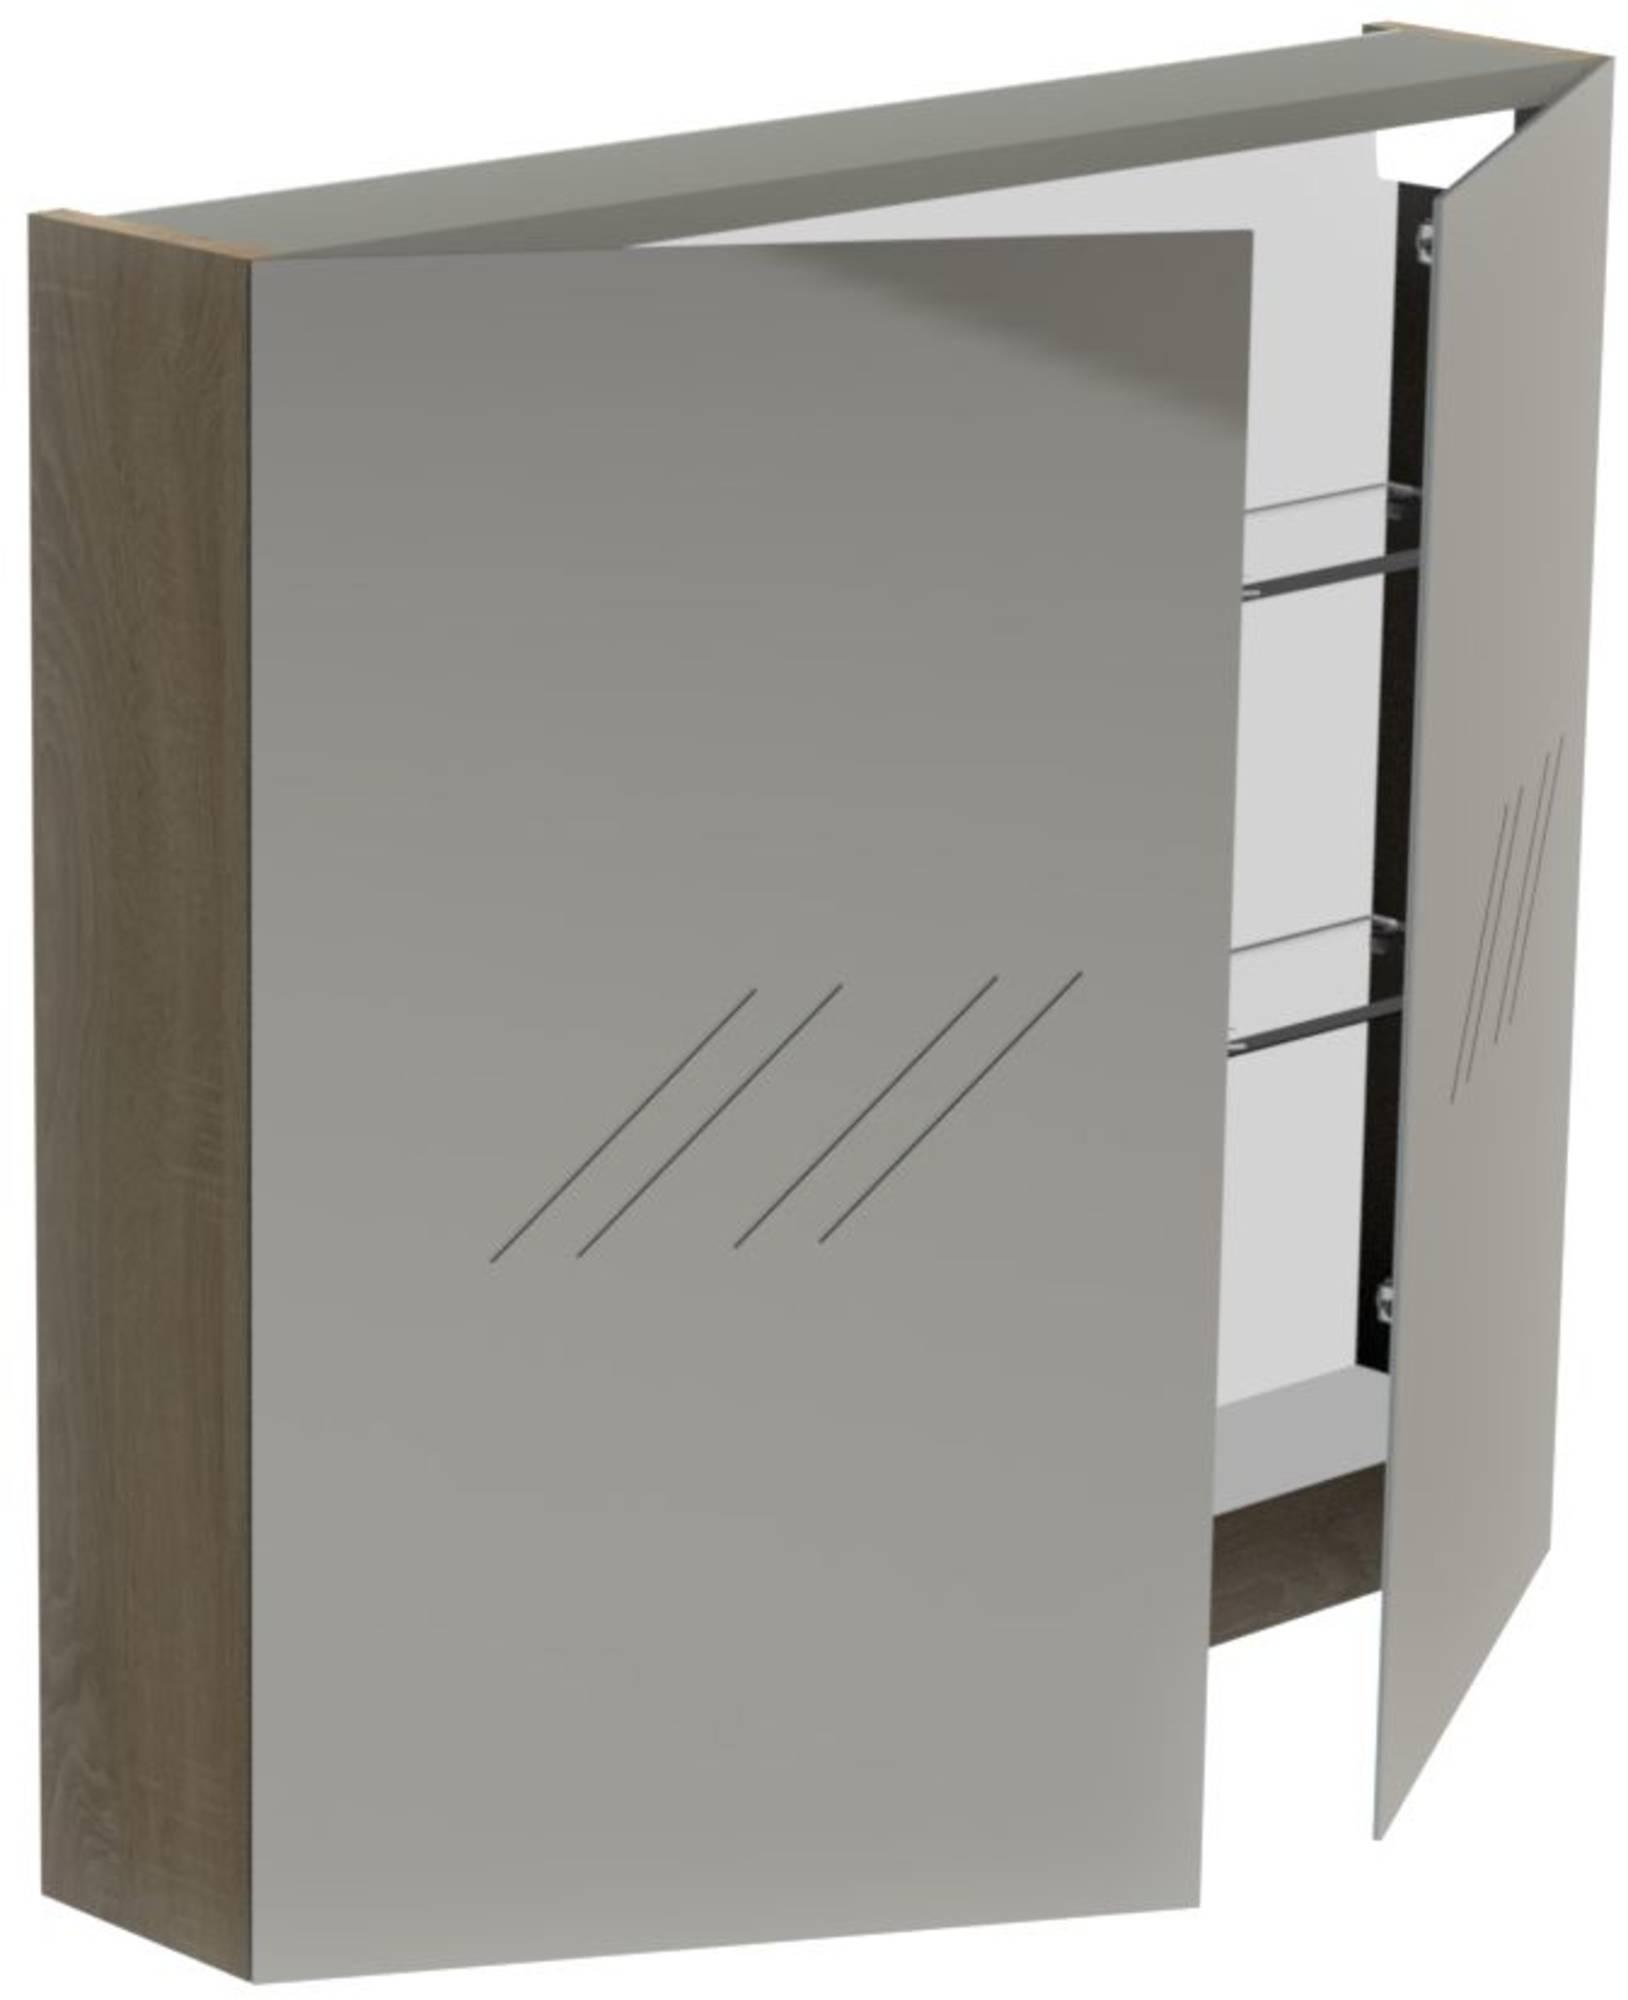 Thebalux Basic Spiegelkast 70x80x13,5 cm Antraciet mat lak